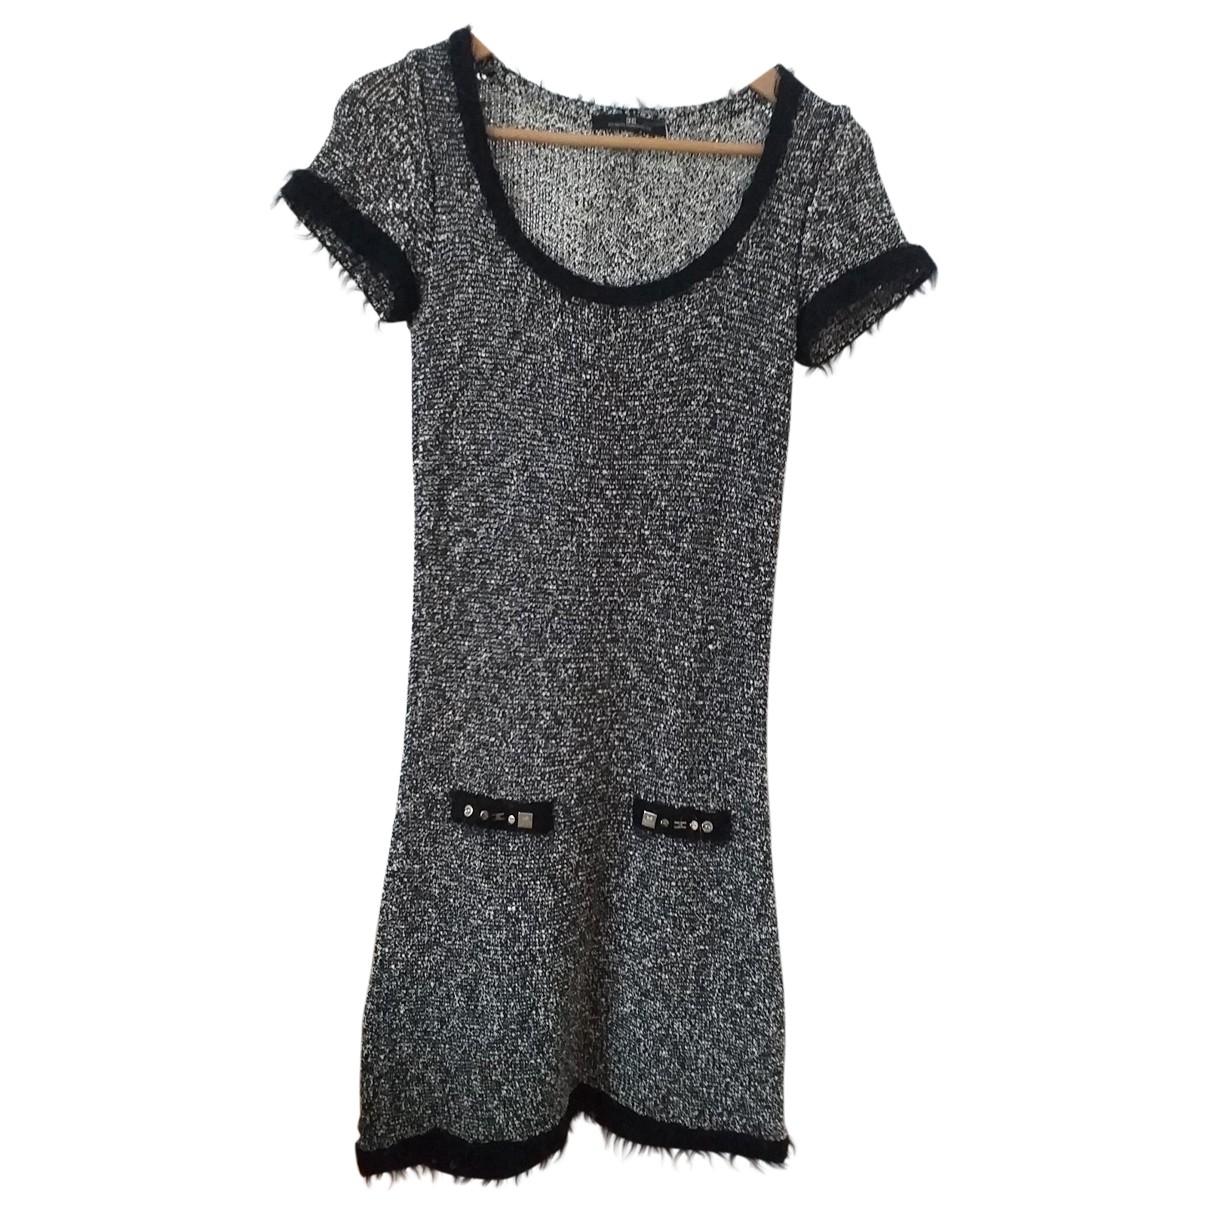 Elisabetta Franchi \N Black Cotton - elasthane dress for Women 40 IT